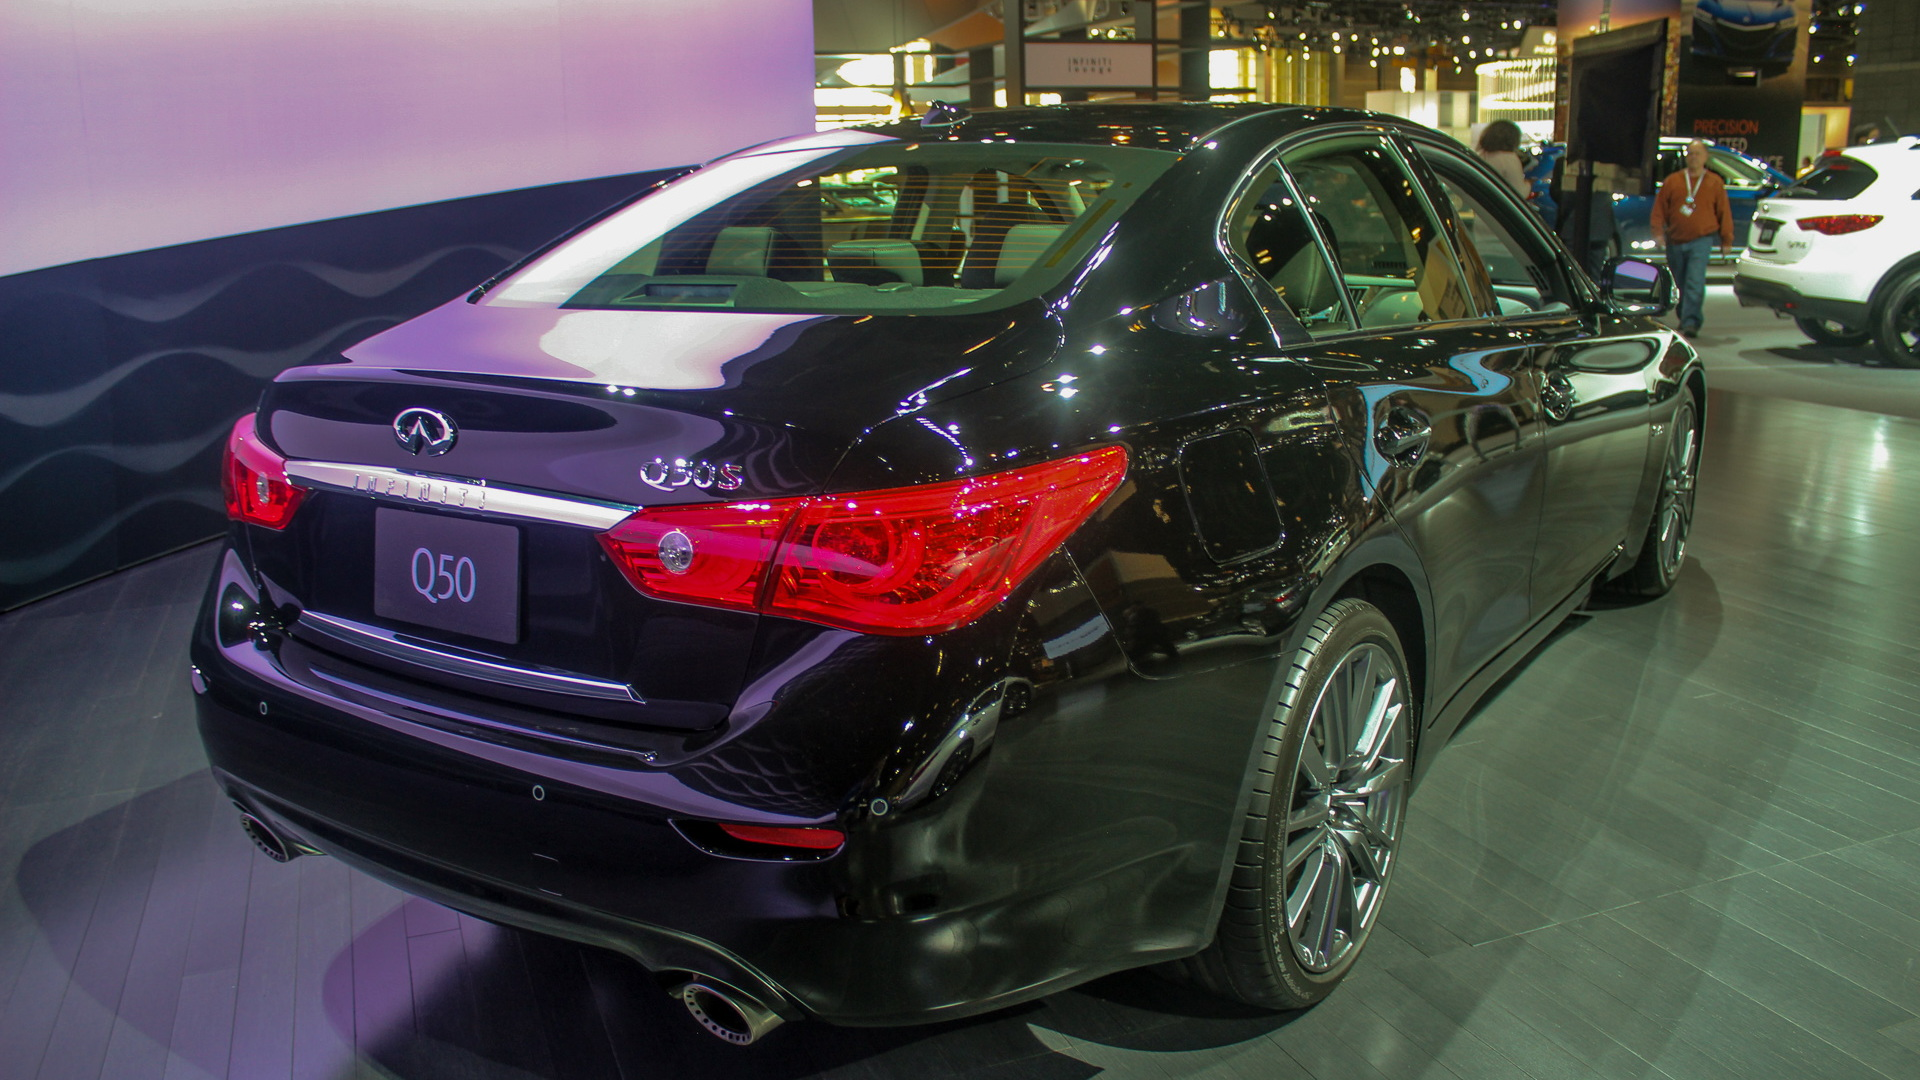 2016 Infiniti Q50 (3.0T Red Sport 400), 2016 Chicago Auto Show